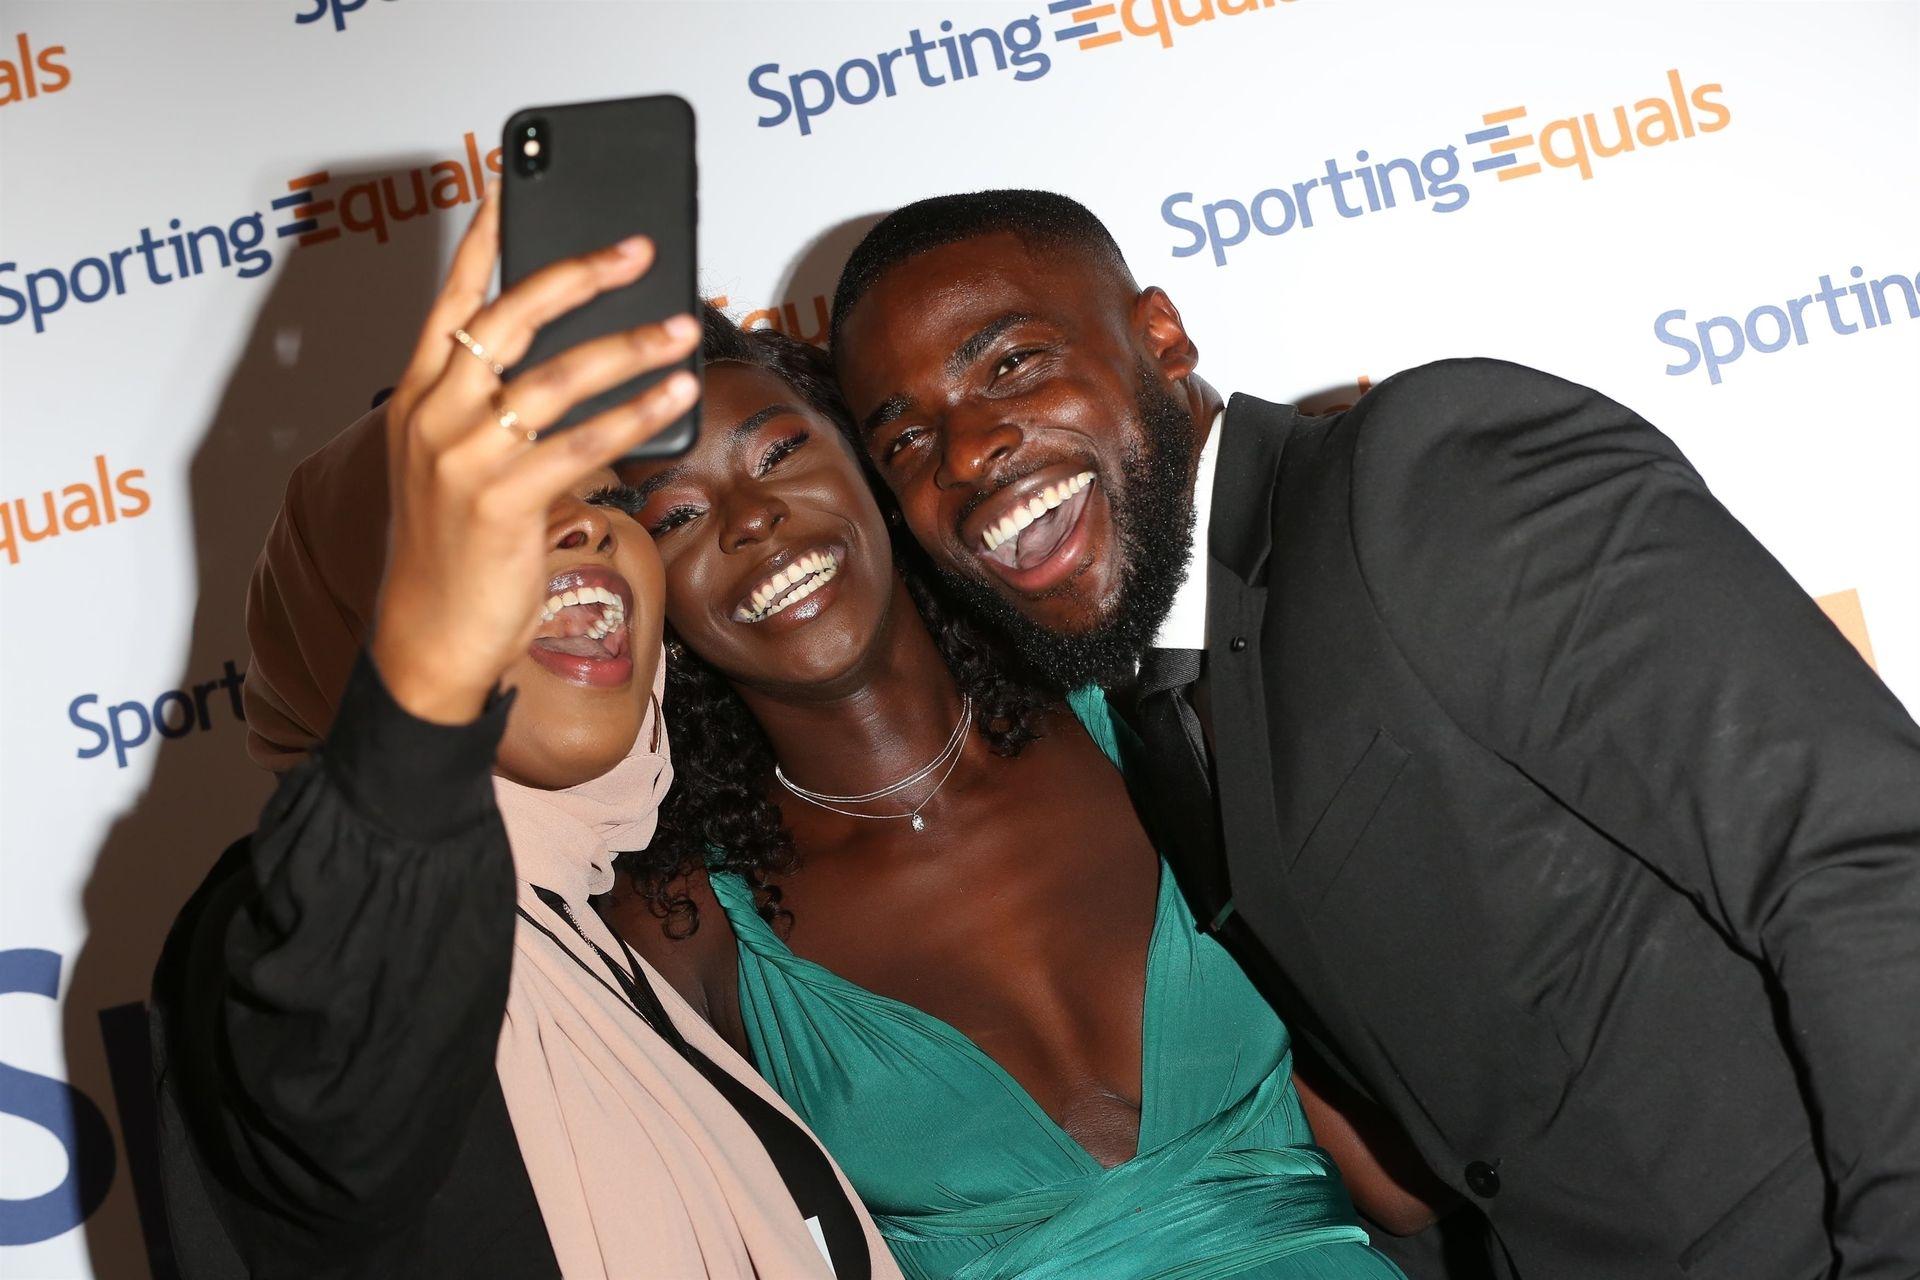 Mike Boateng & Priscilla Anyabu Are Seen At British Ethnic Diversity Sports Awards 0081